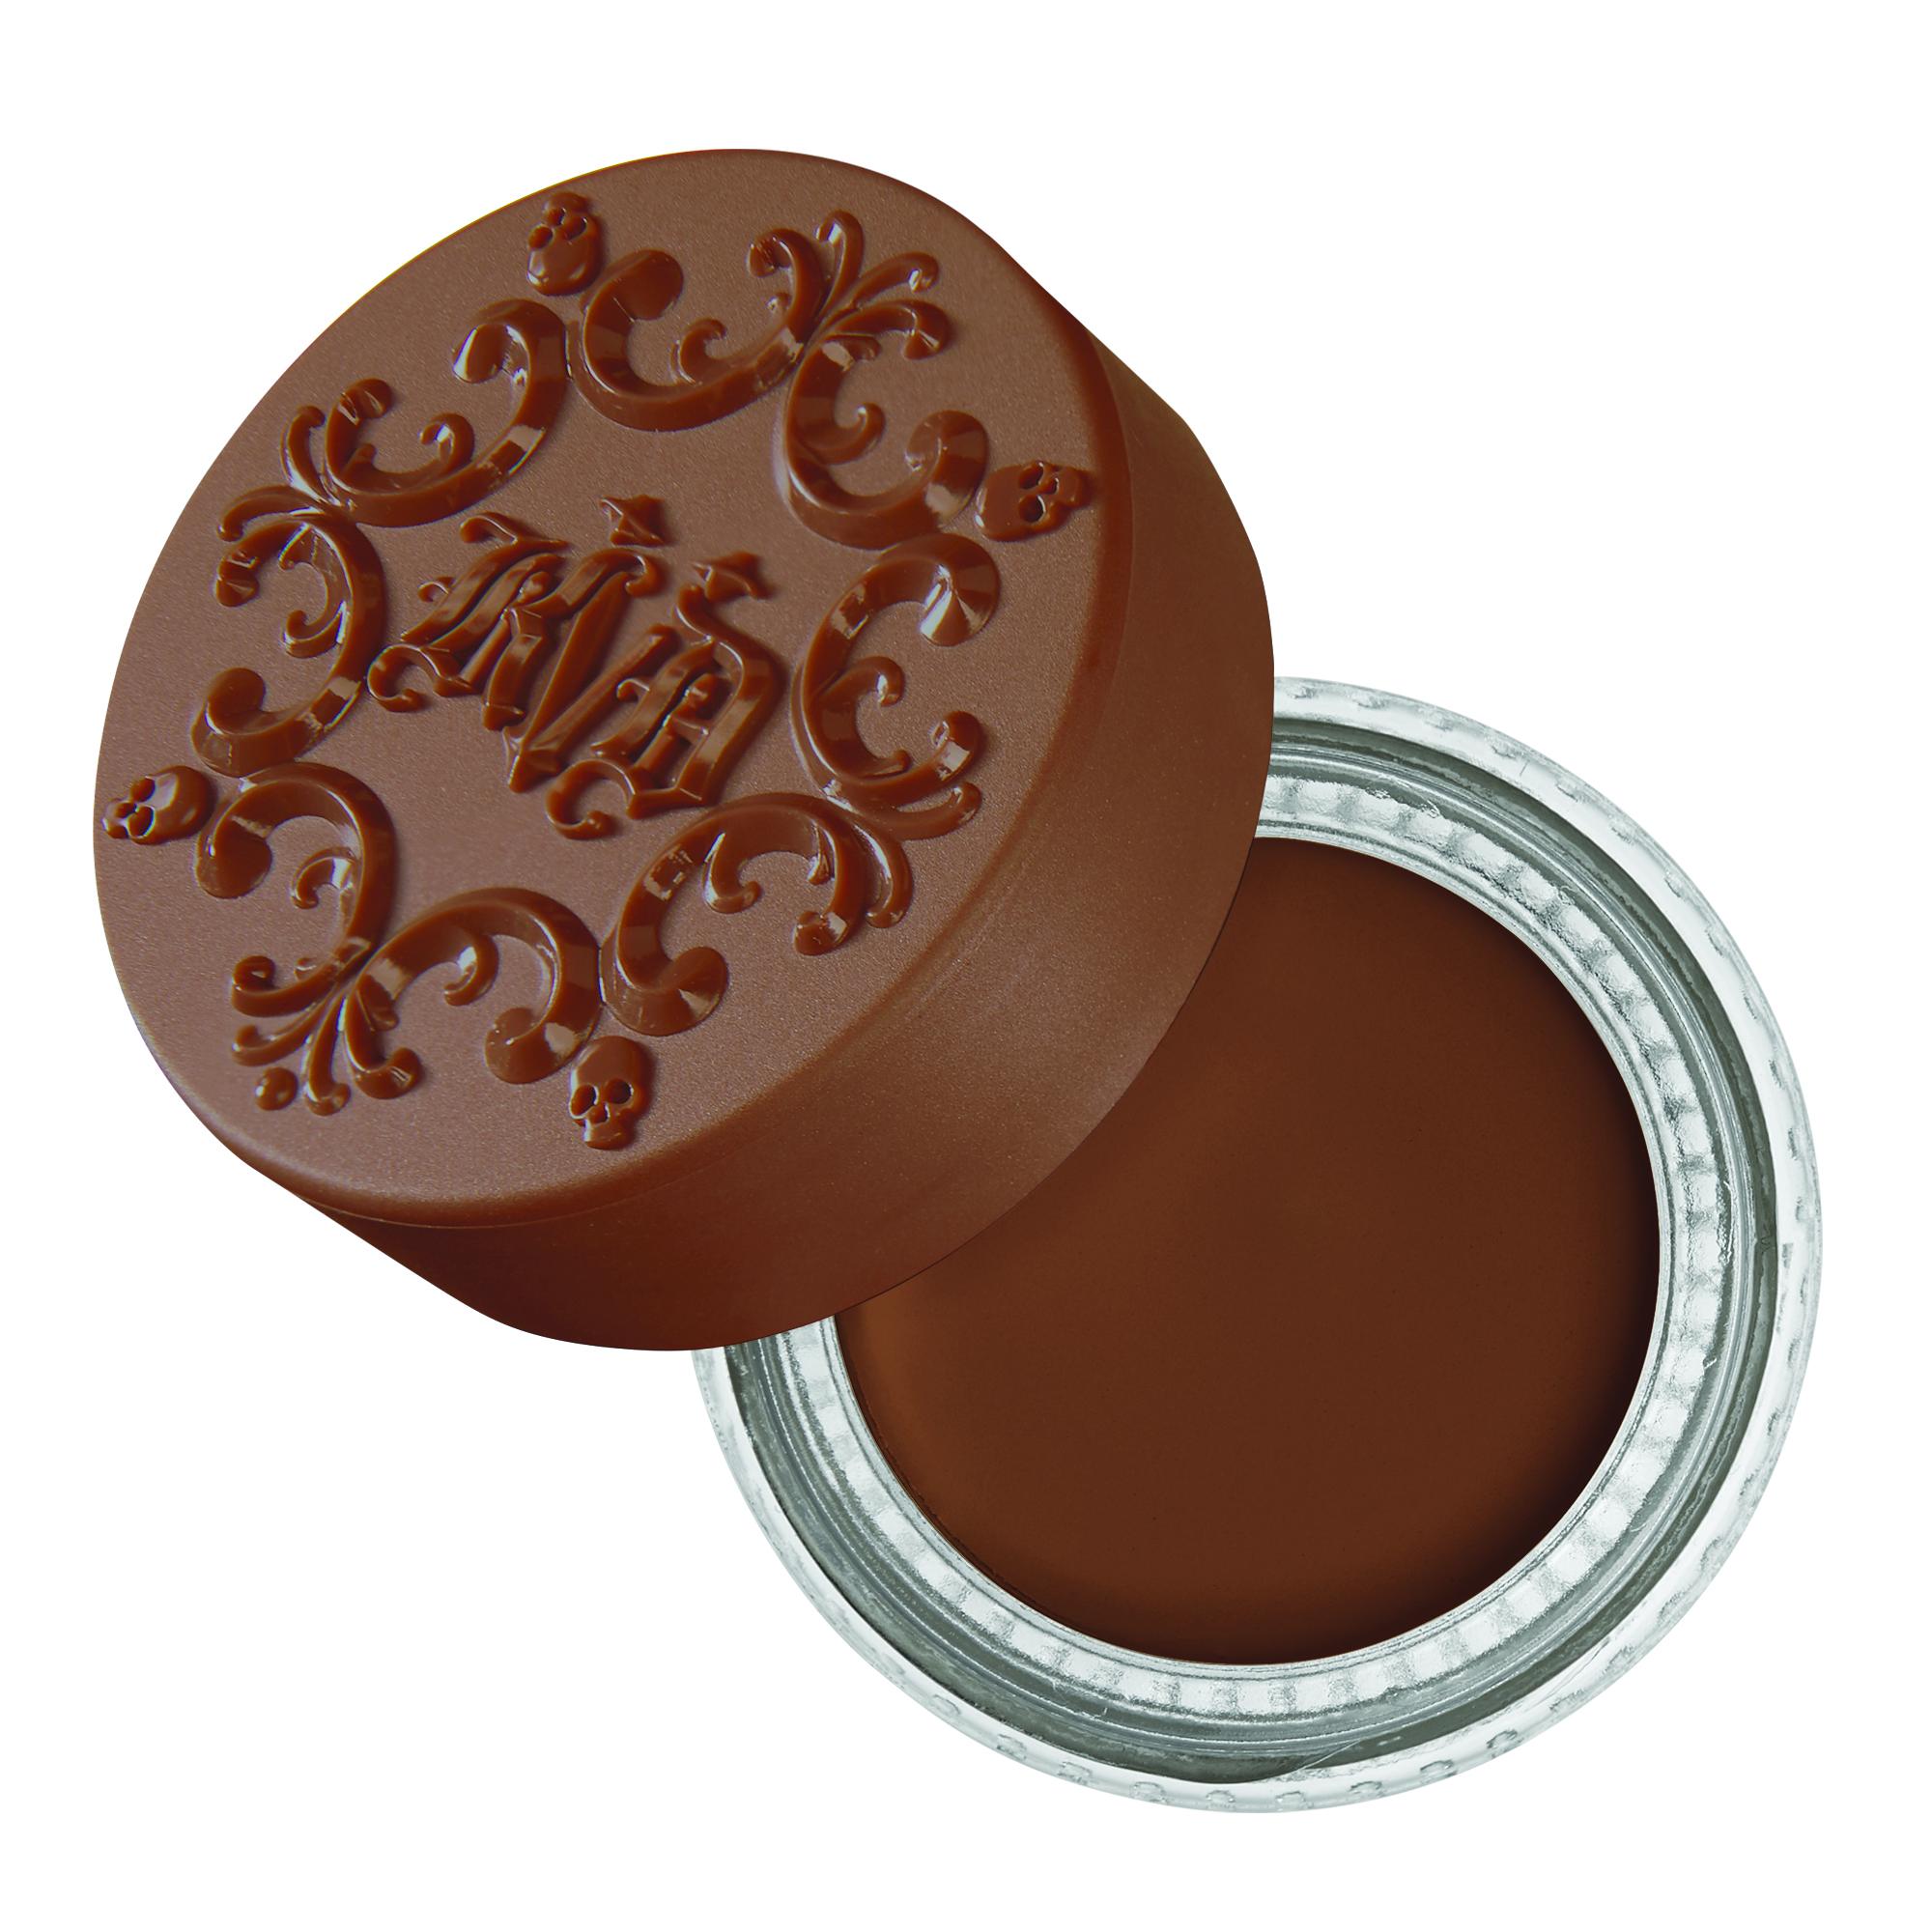 KVD Beauty Brow Creme Pot, auburn